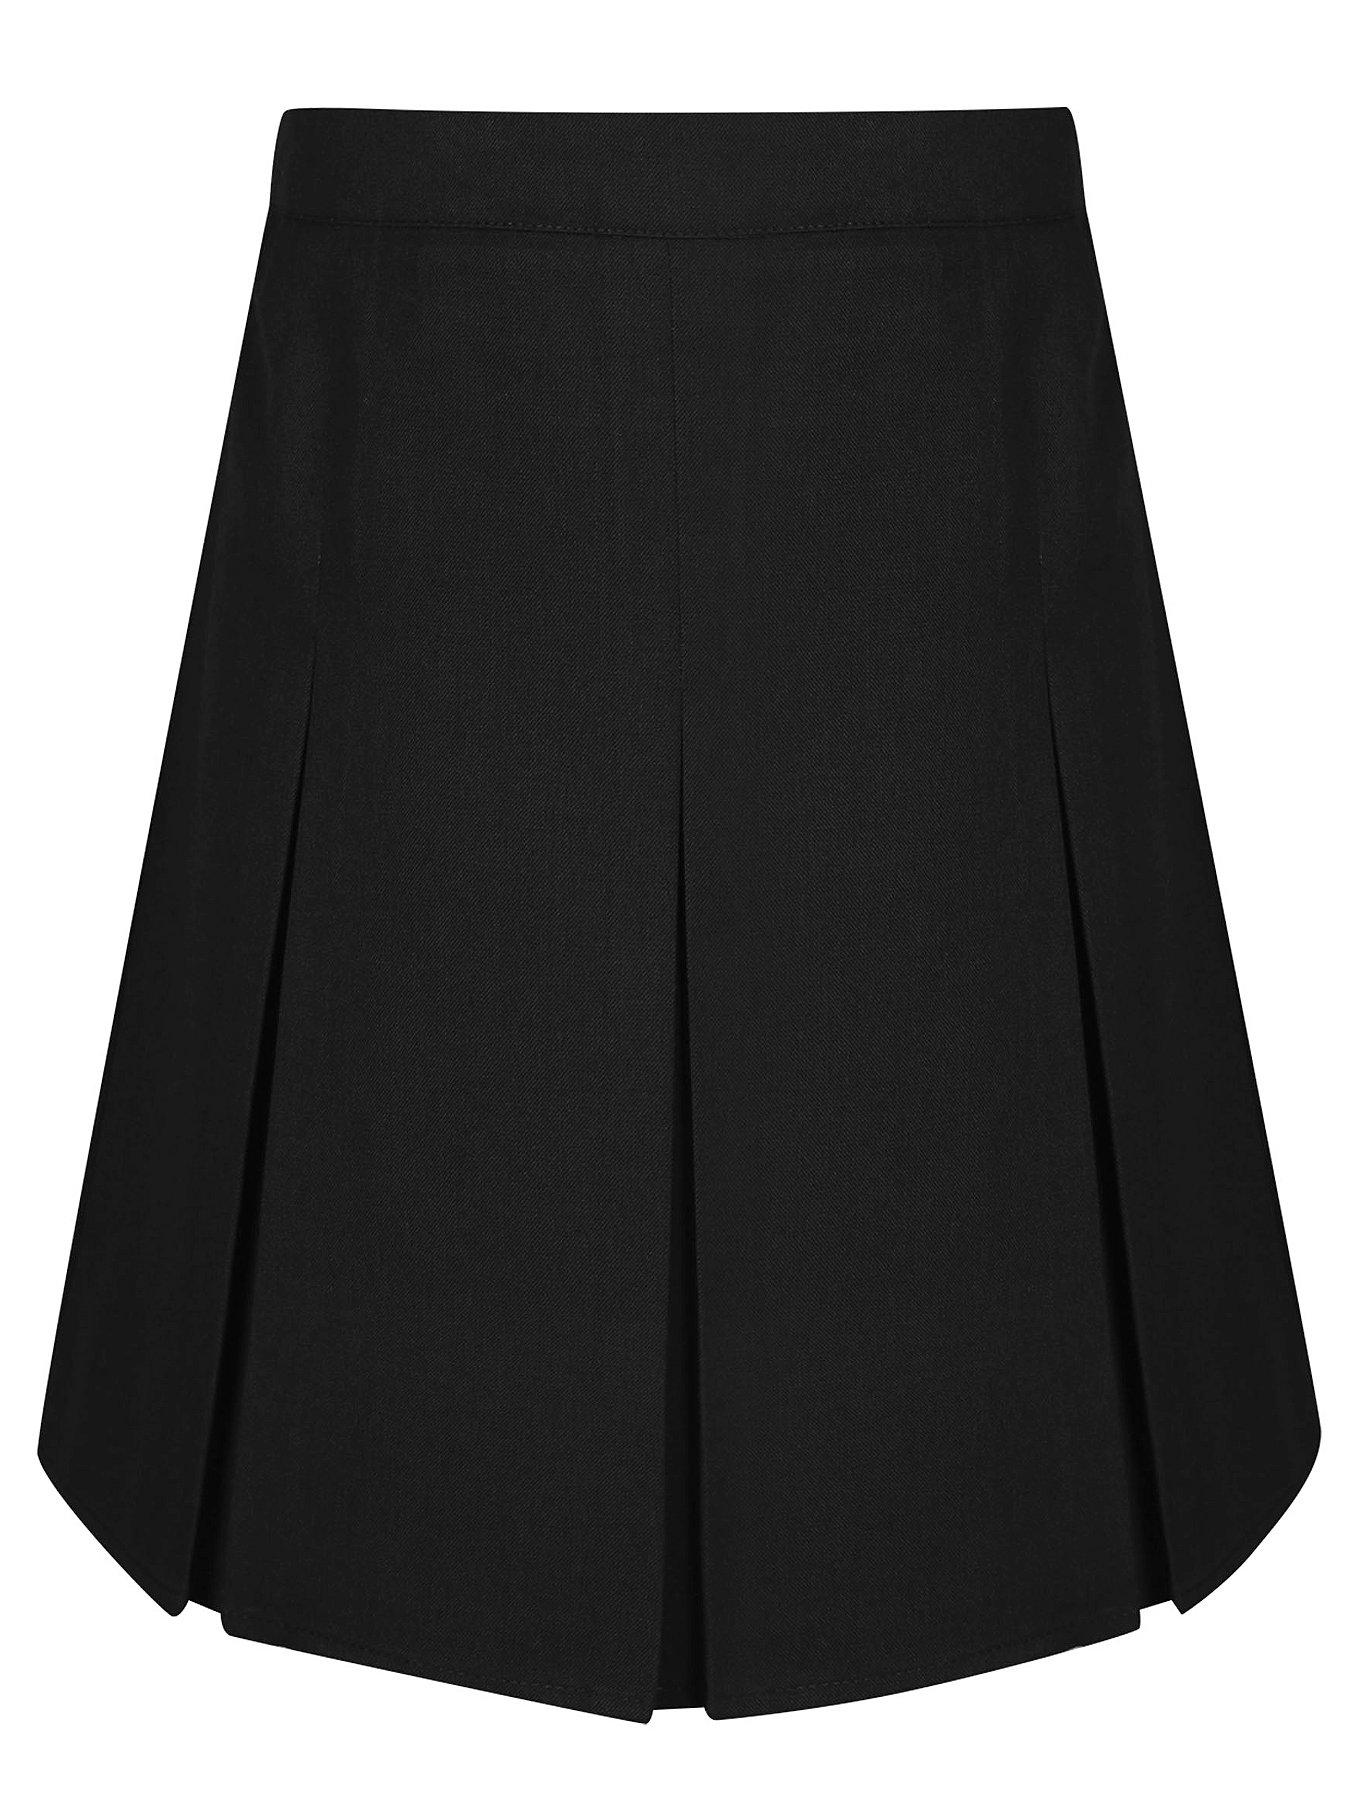 374b2087ce Girls Black School Pleated Skirt | School | George